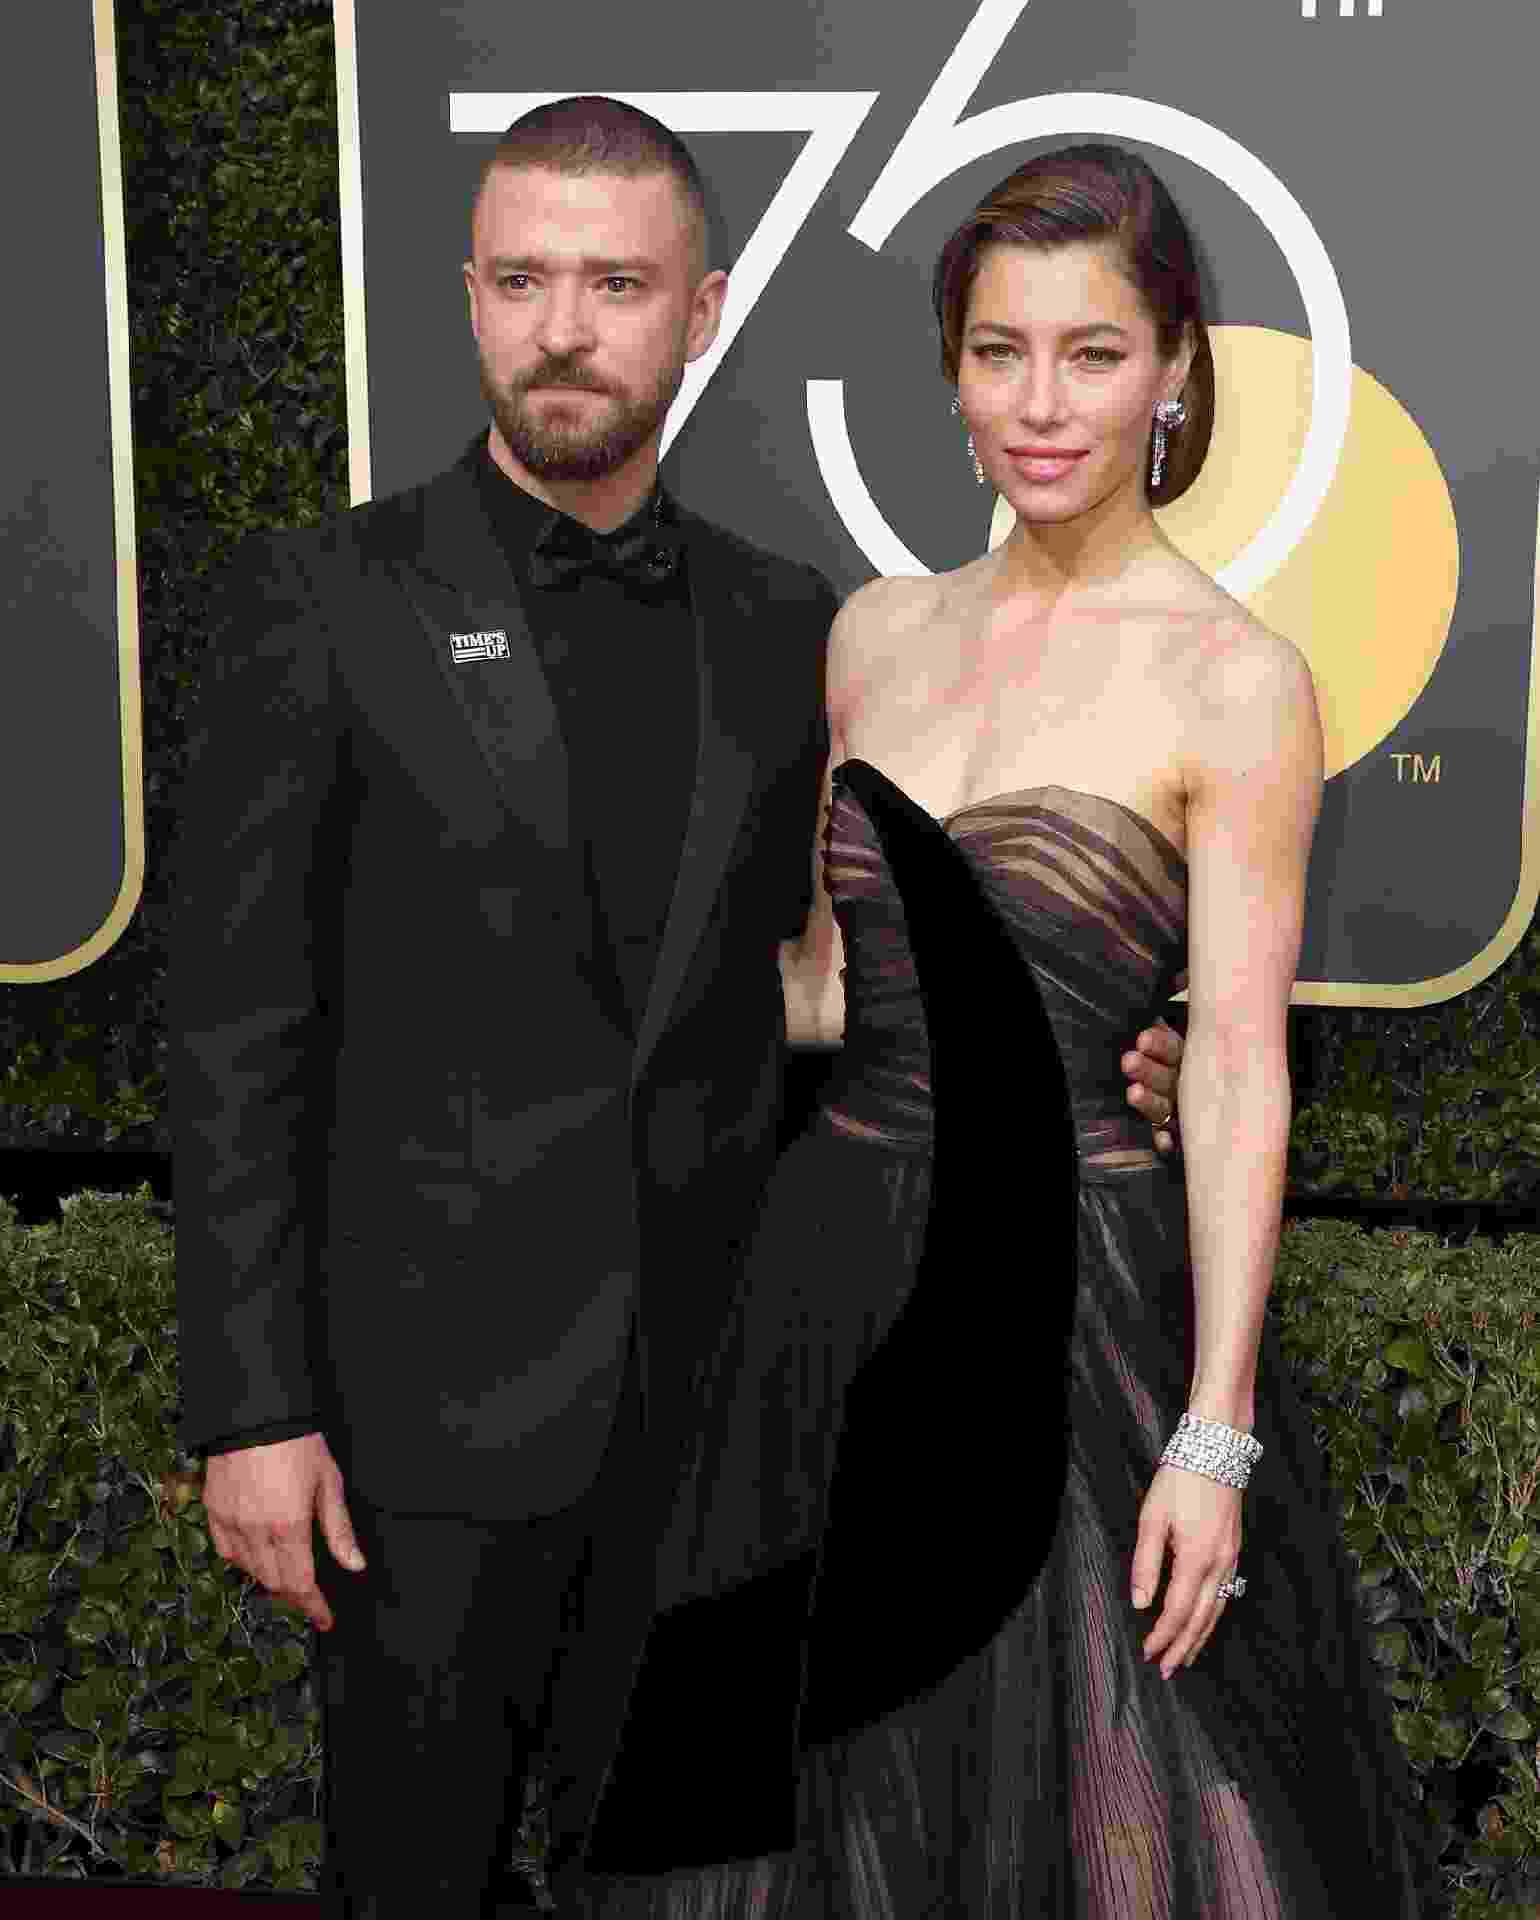 Justin Timberlake e Jessica Biel chegam ao Globo de Ouro 2018 - Getty Images